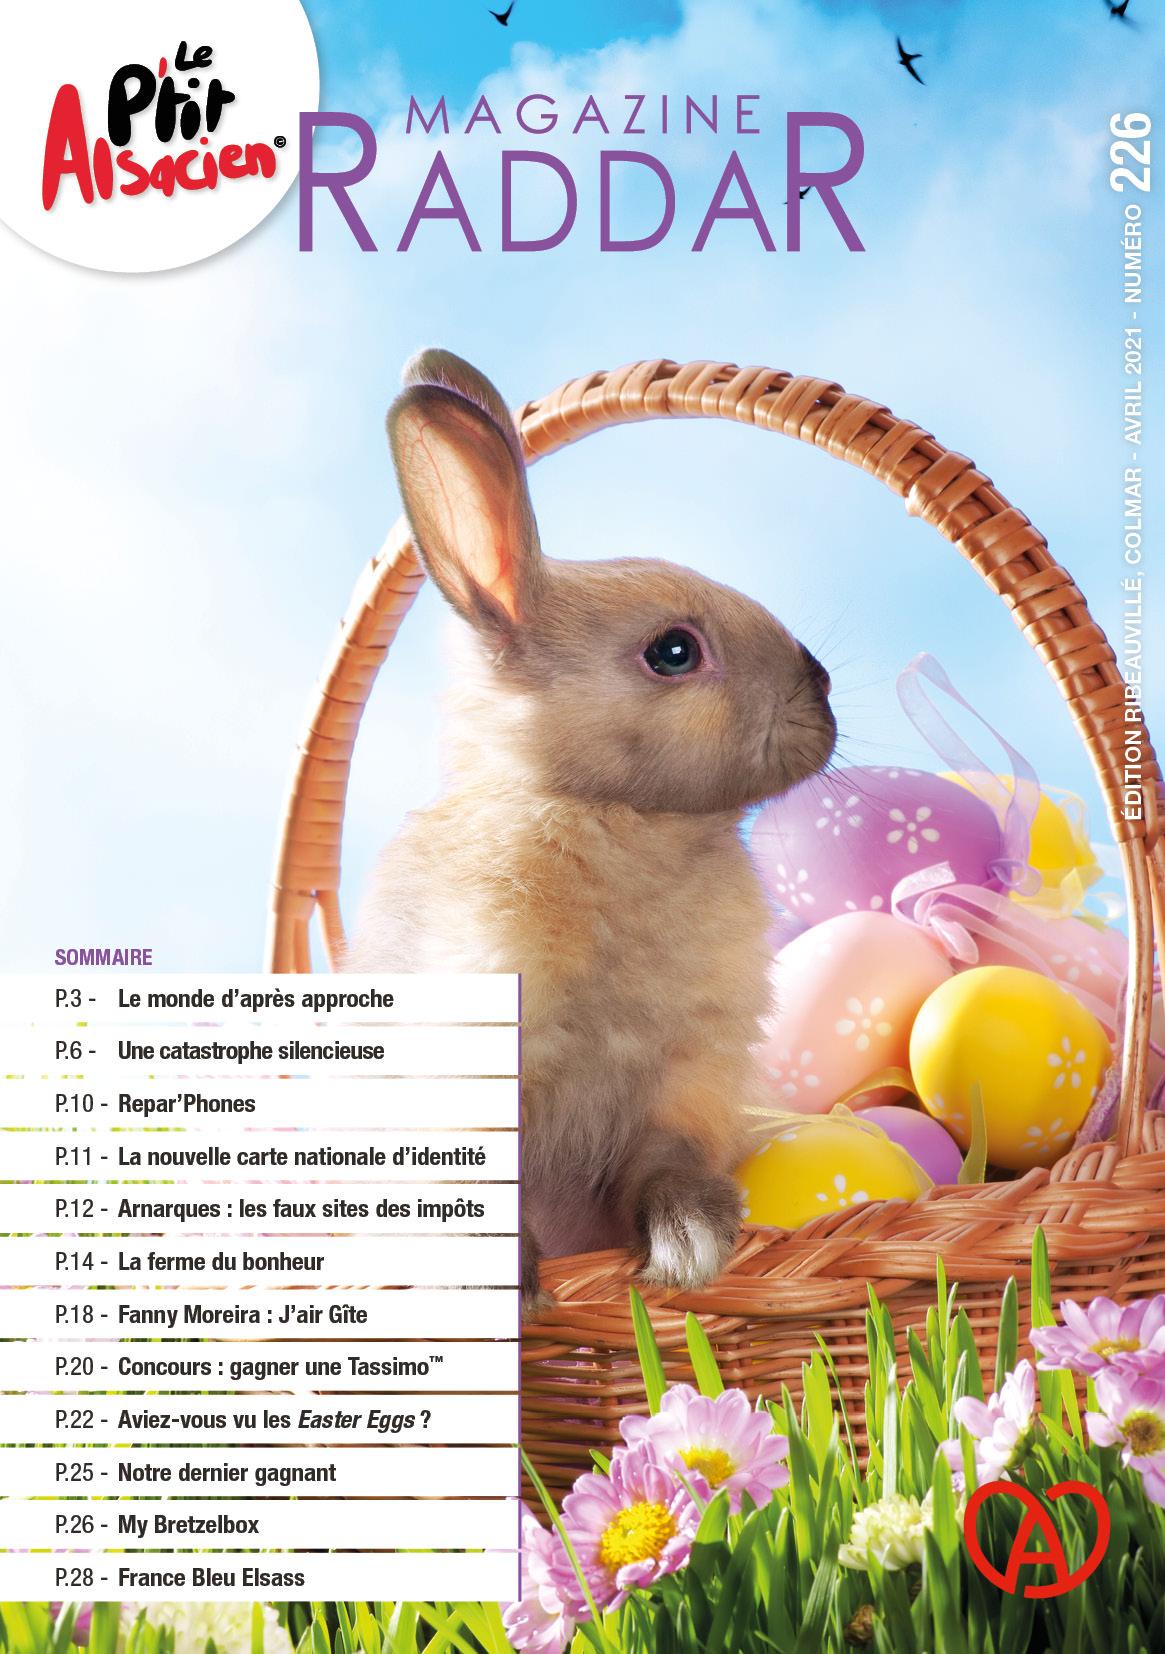 Magazine raddar - avril 2021